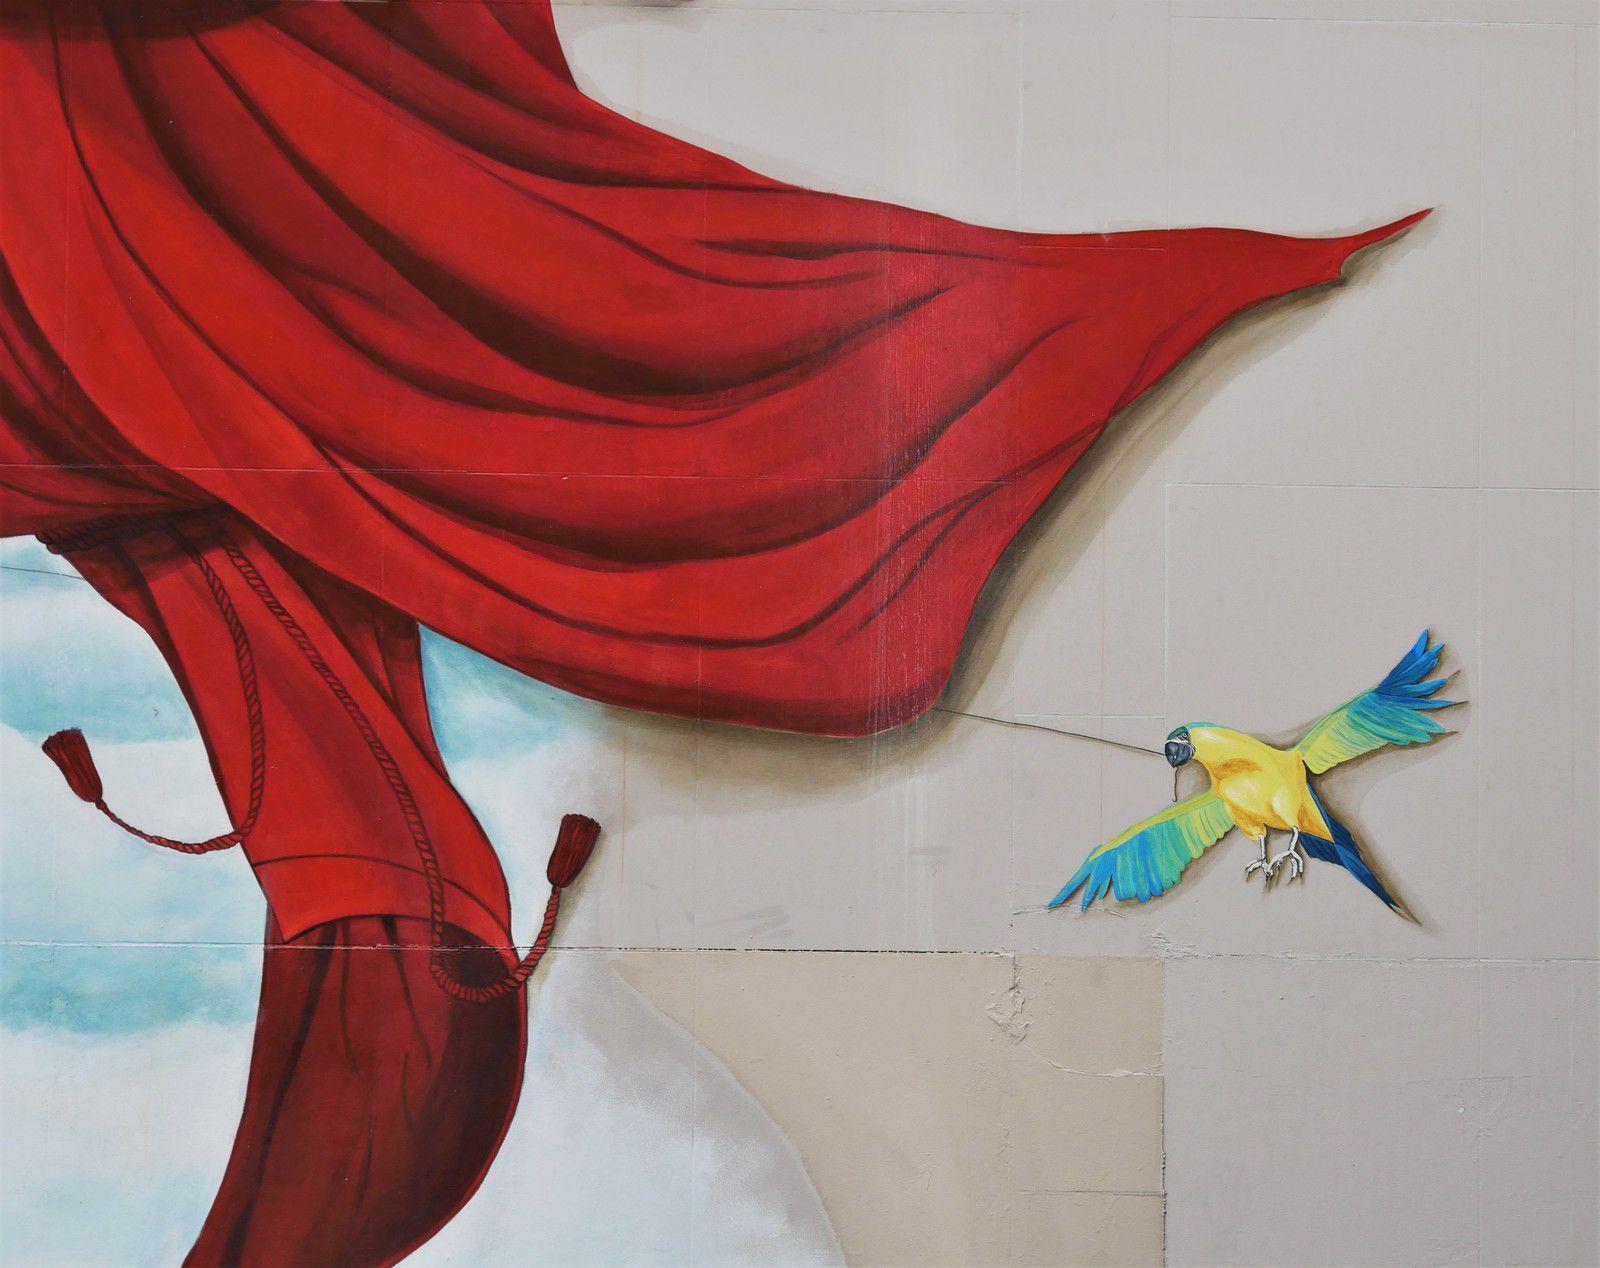 Fresque du cirque rue des Martyrs. Médrano.